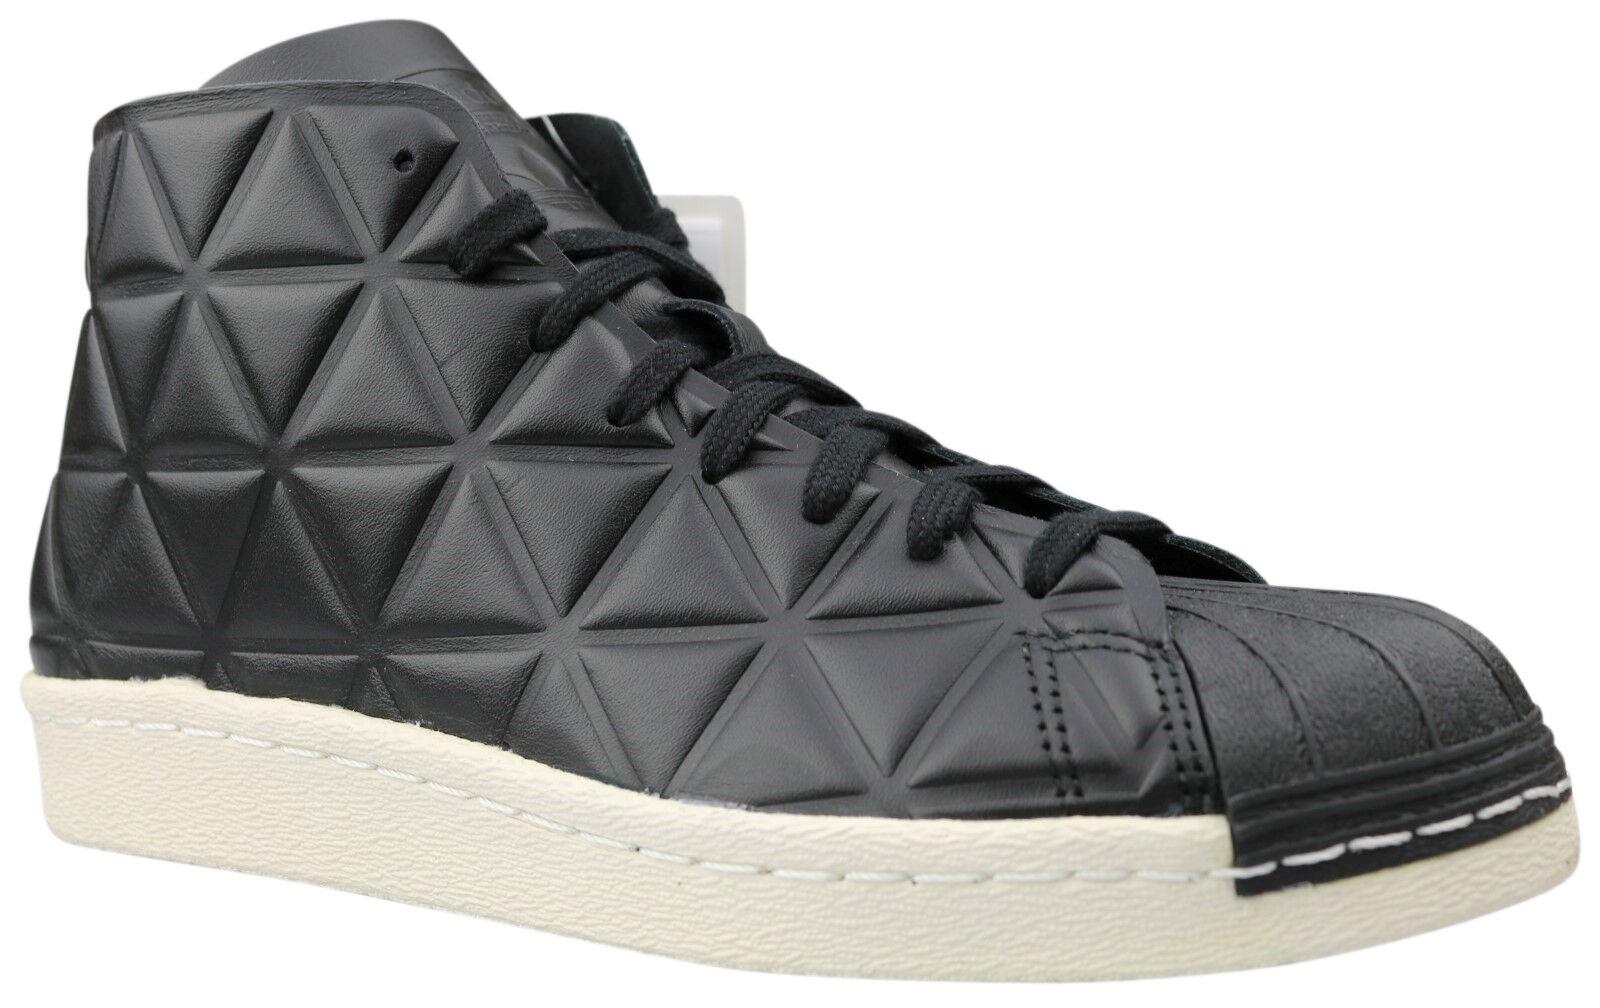 Adidas PRO MODEL 80s Polygon W Damen 37 Sneaker Schuhe S80562 Gr. 37 Damen - 40,5 NEU OVP e8af8a